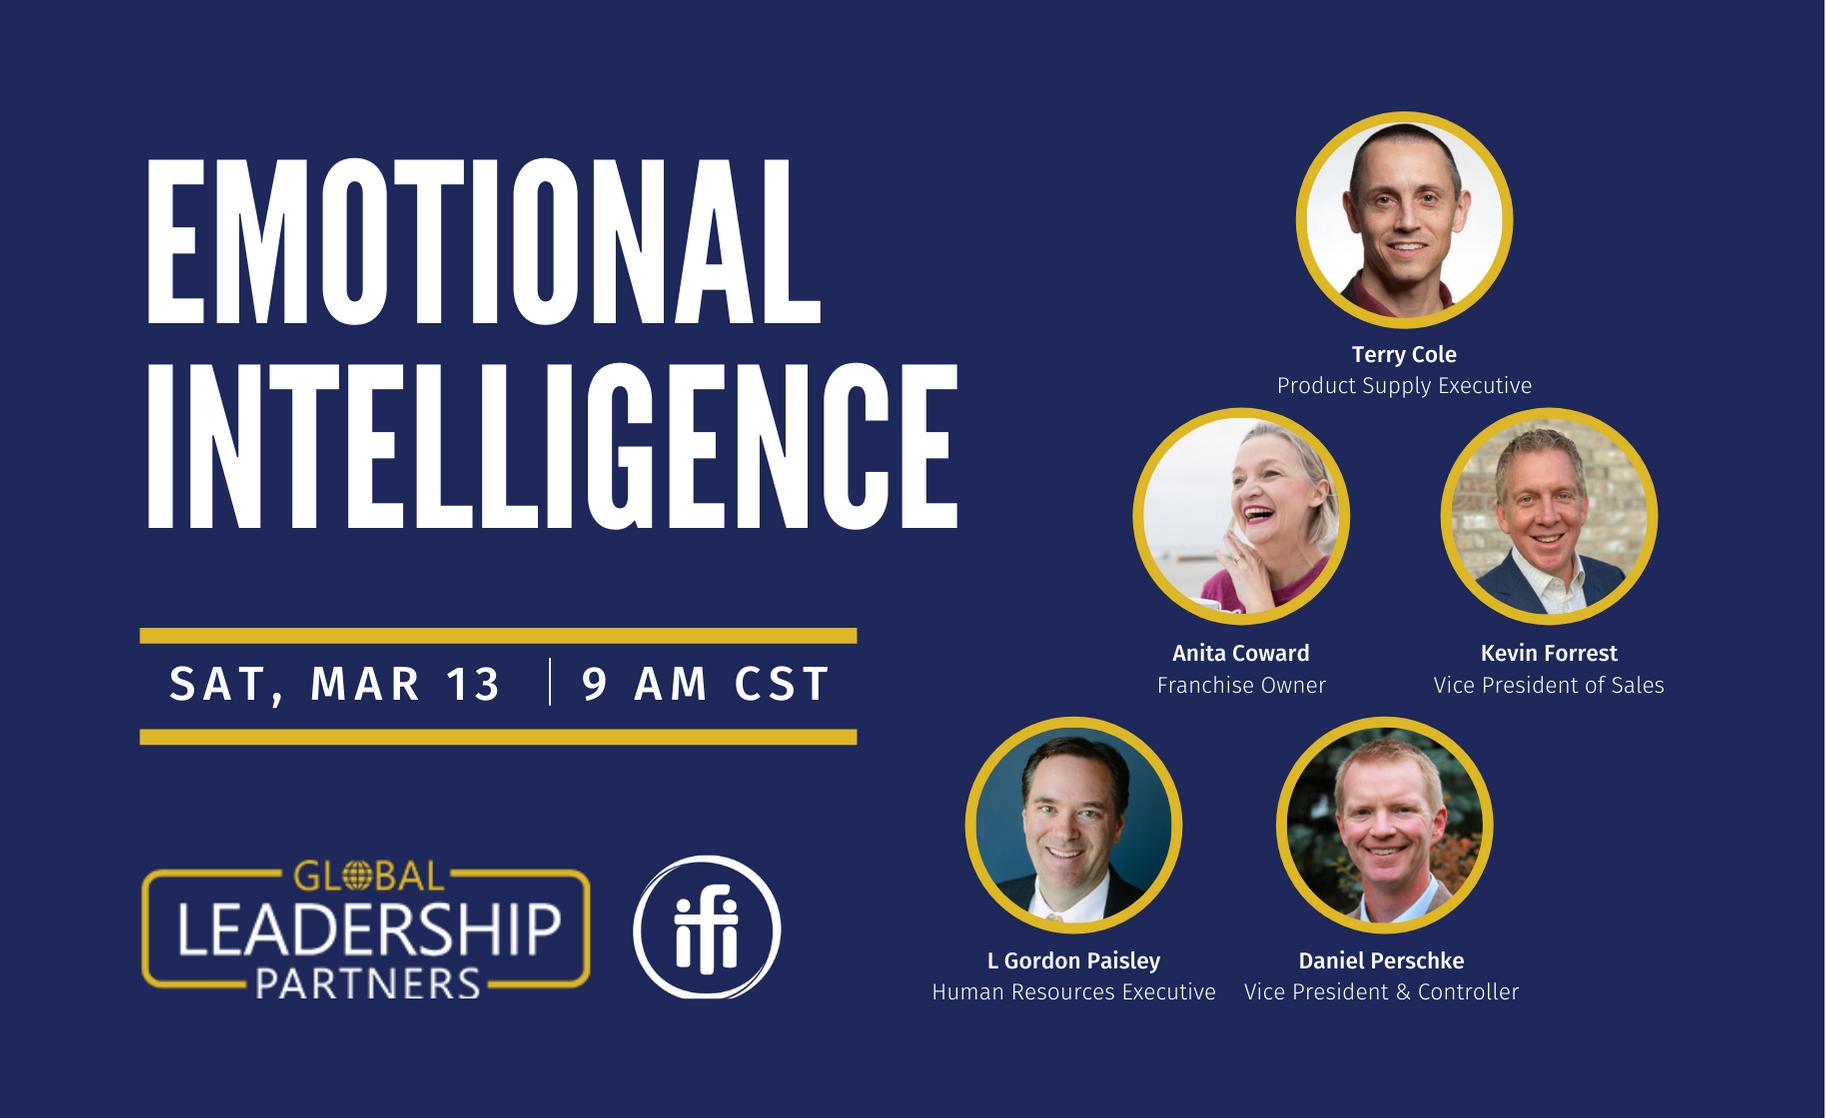 Emotional Intelligence Seminar